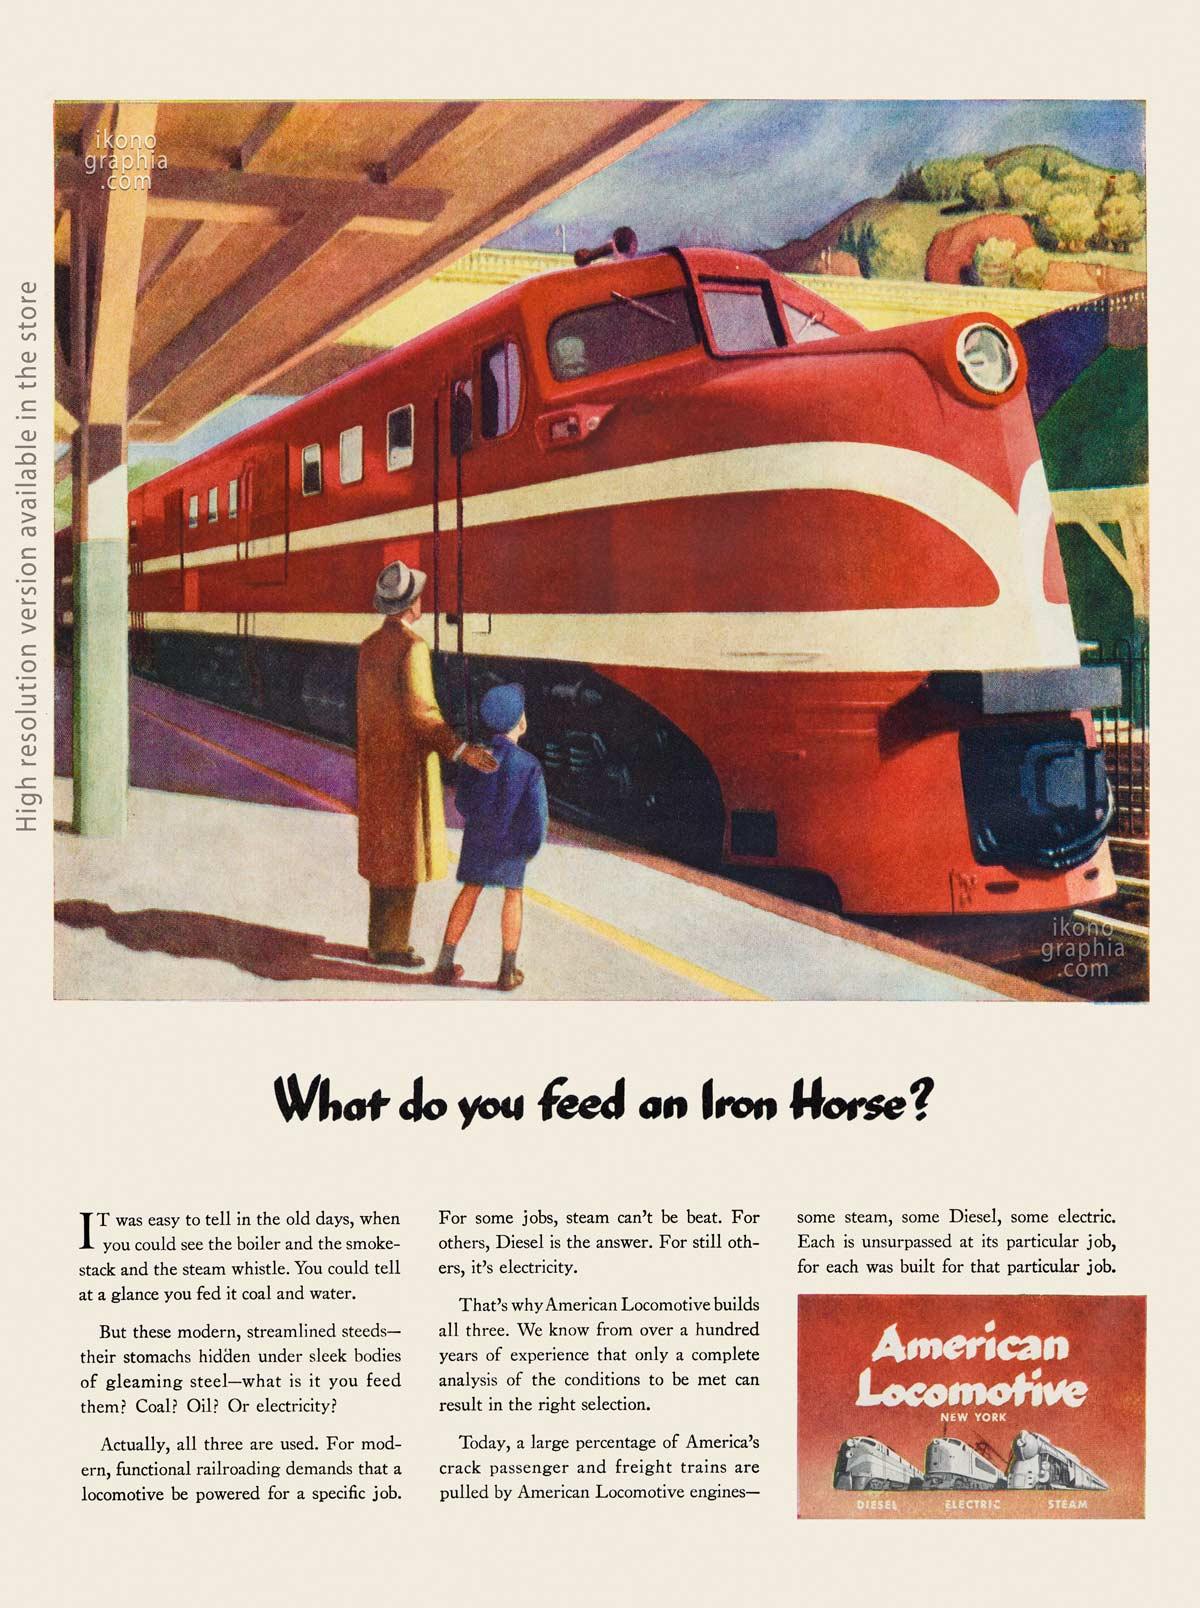 What do you feed an Iron Horse? - American Locomotive Ad - Life Magazine. February 21, 1944 - Artwork by Edward Hopper